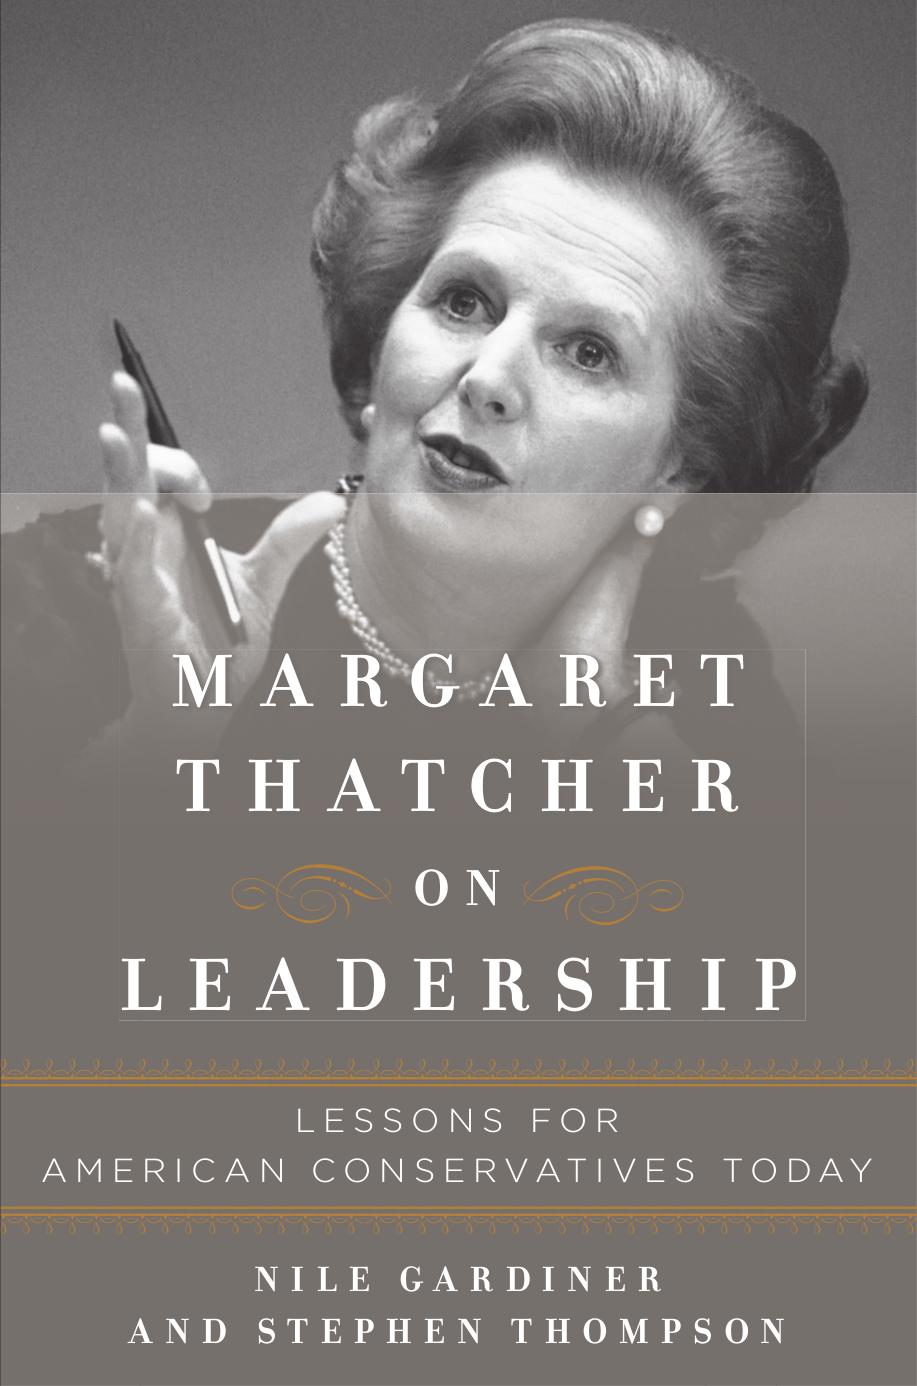 leadership traits of margaret thatcher Margaret thatcher was one of the most margaret thatcher was born margaret thatcher felt betrayed facing a leadership vote she called in members.